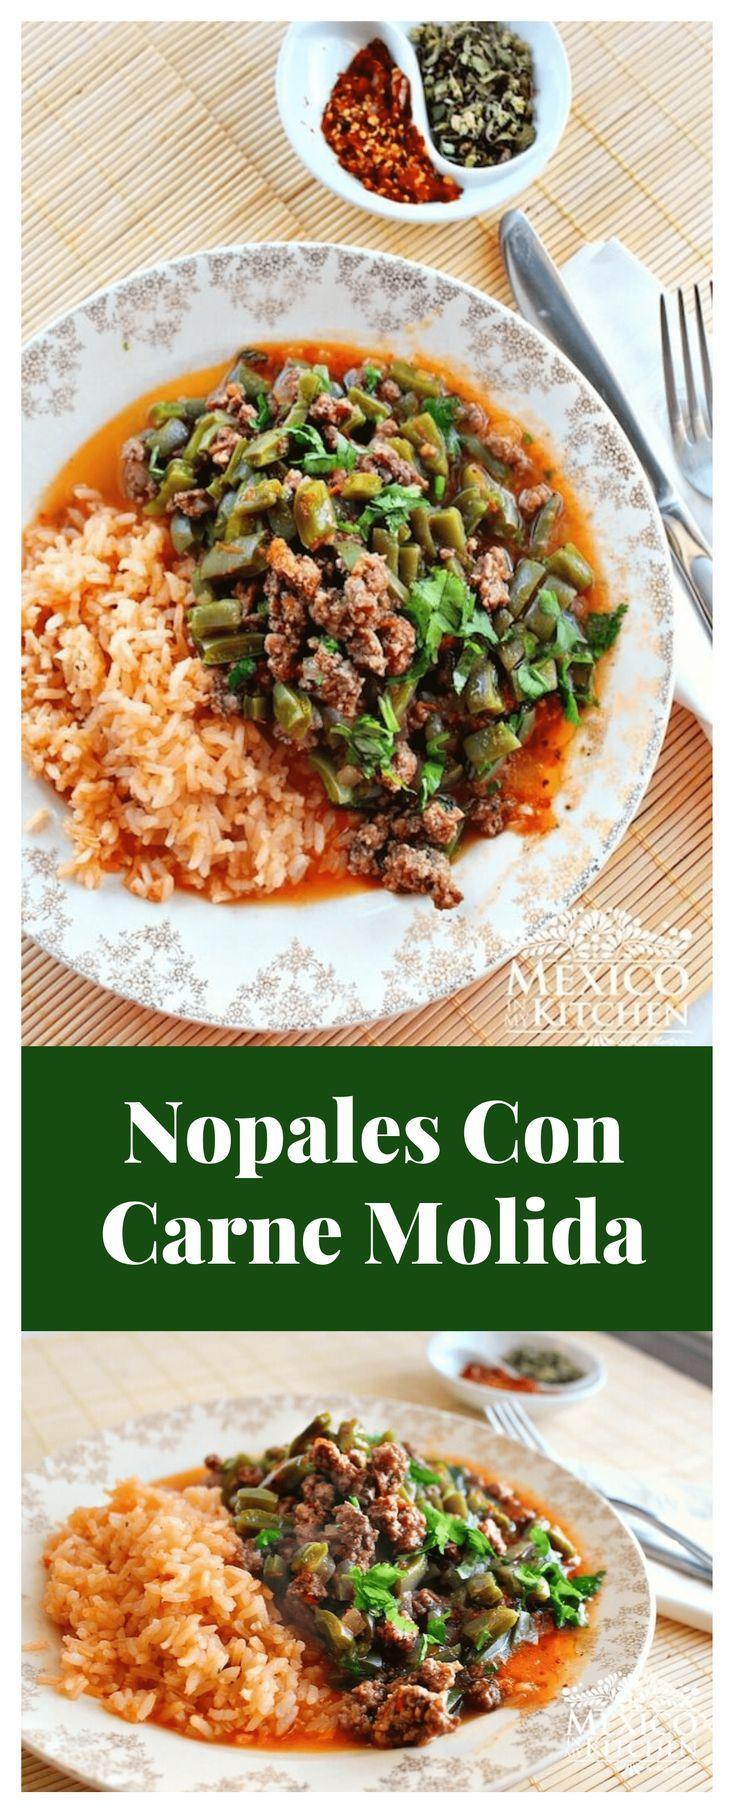 como hacer arroz mexicano hoodwink salsa de tomate